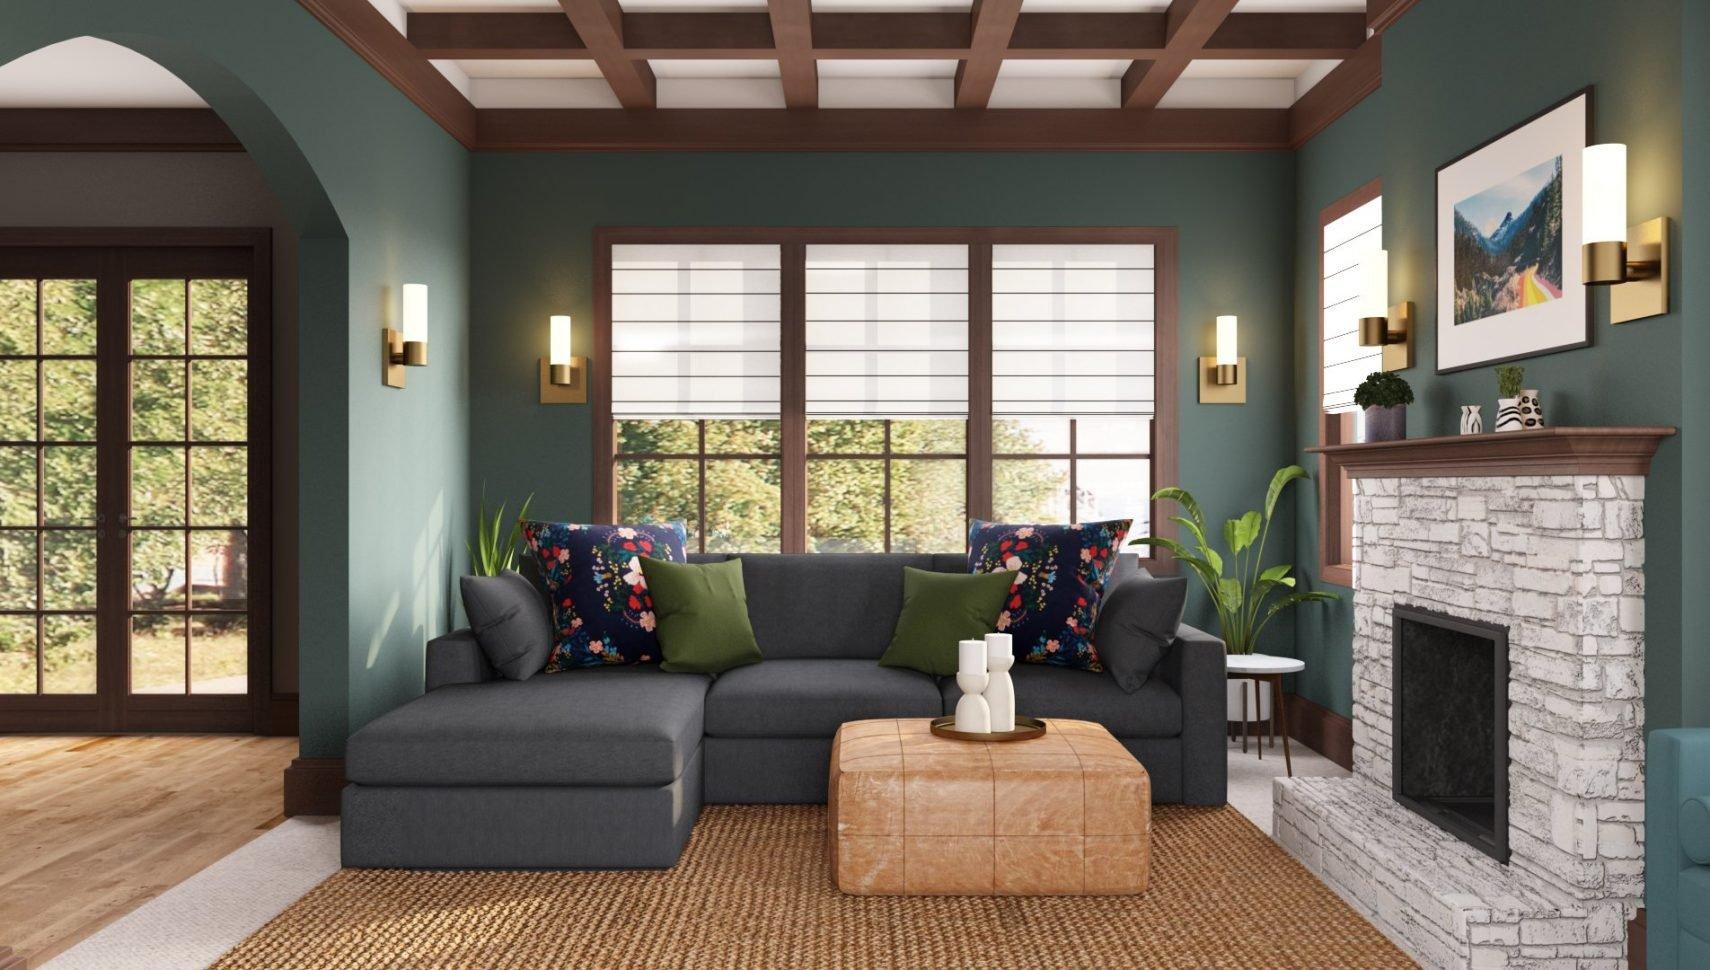 5 Living Room Paint Color Ideas To, Living Room Paint Colors Ideas 2021